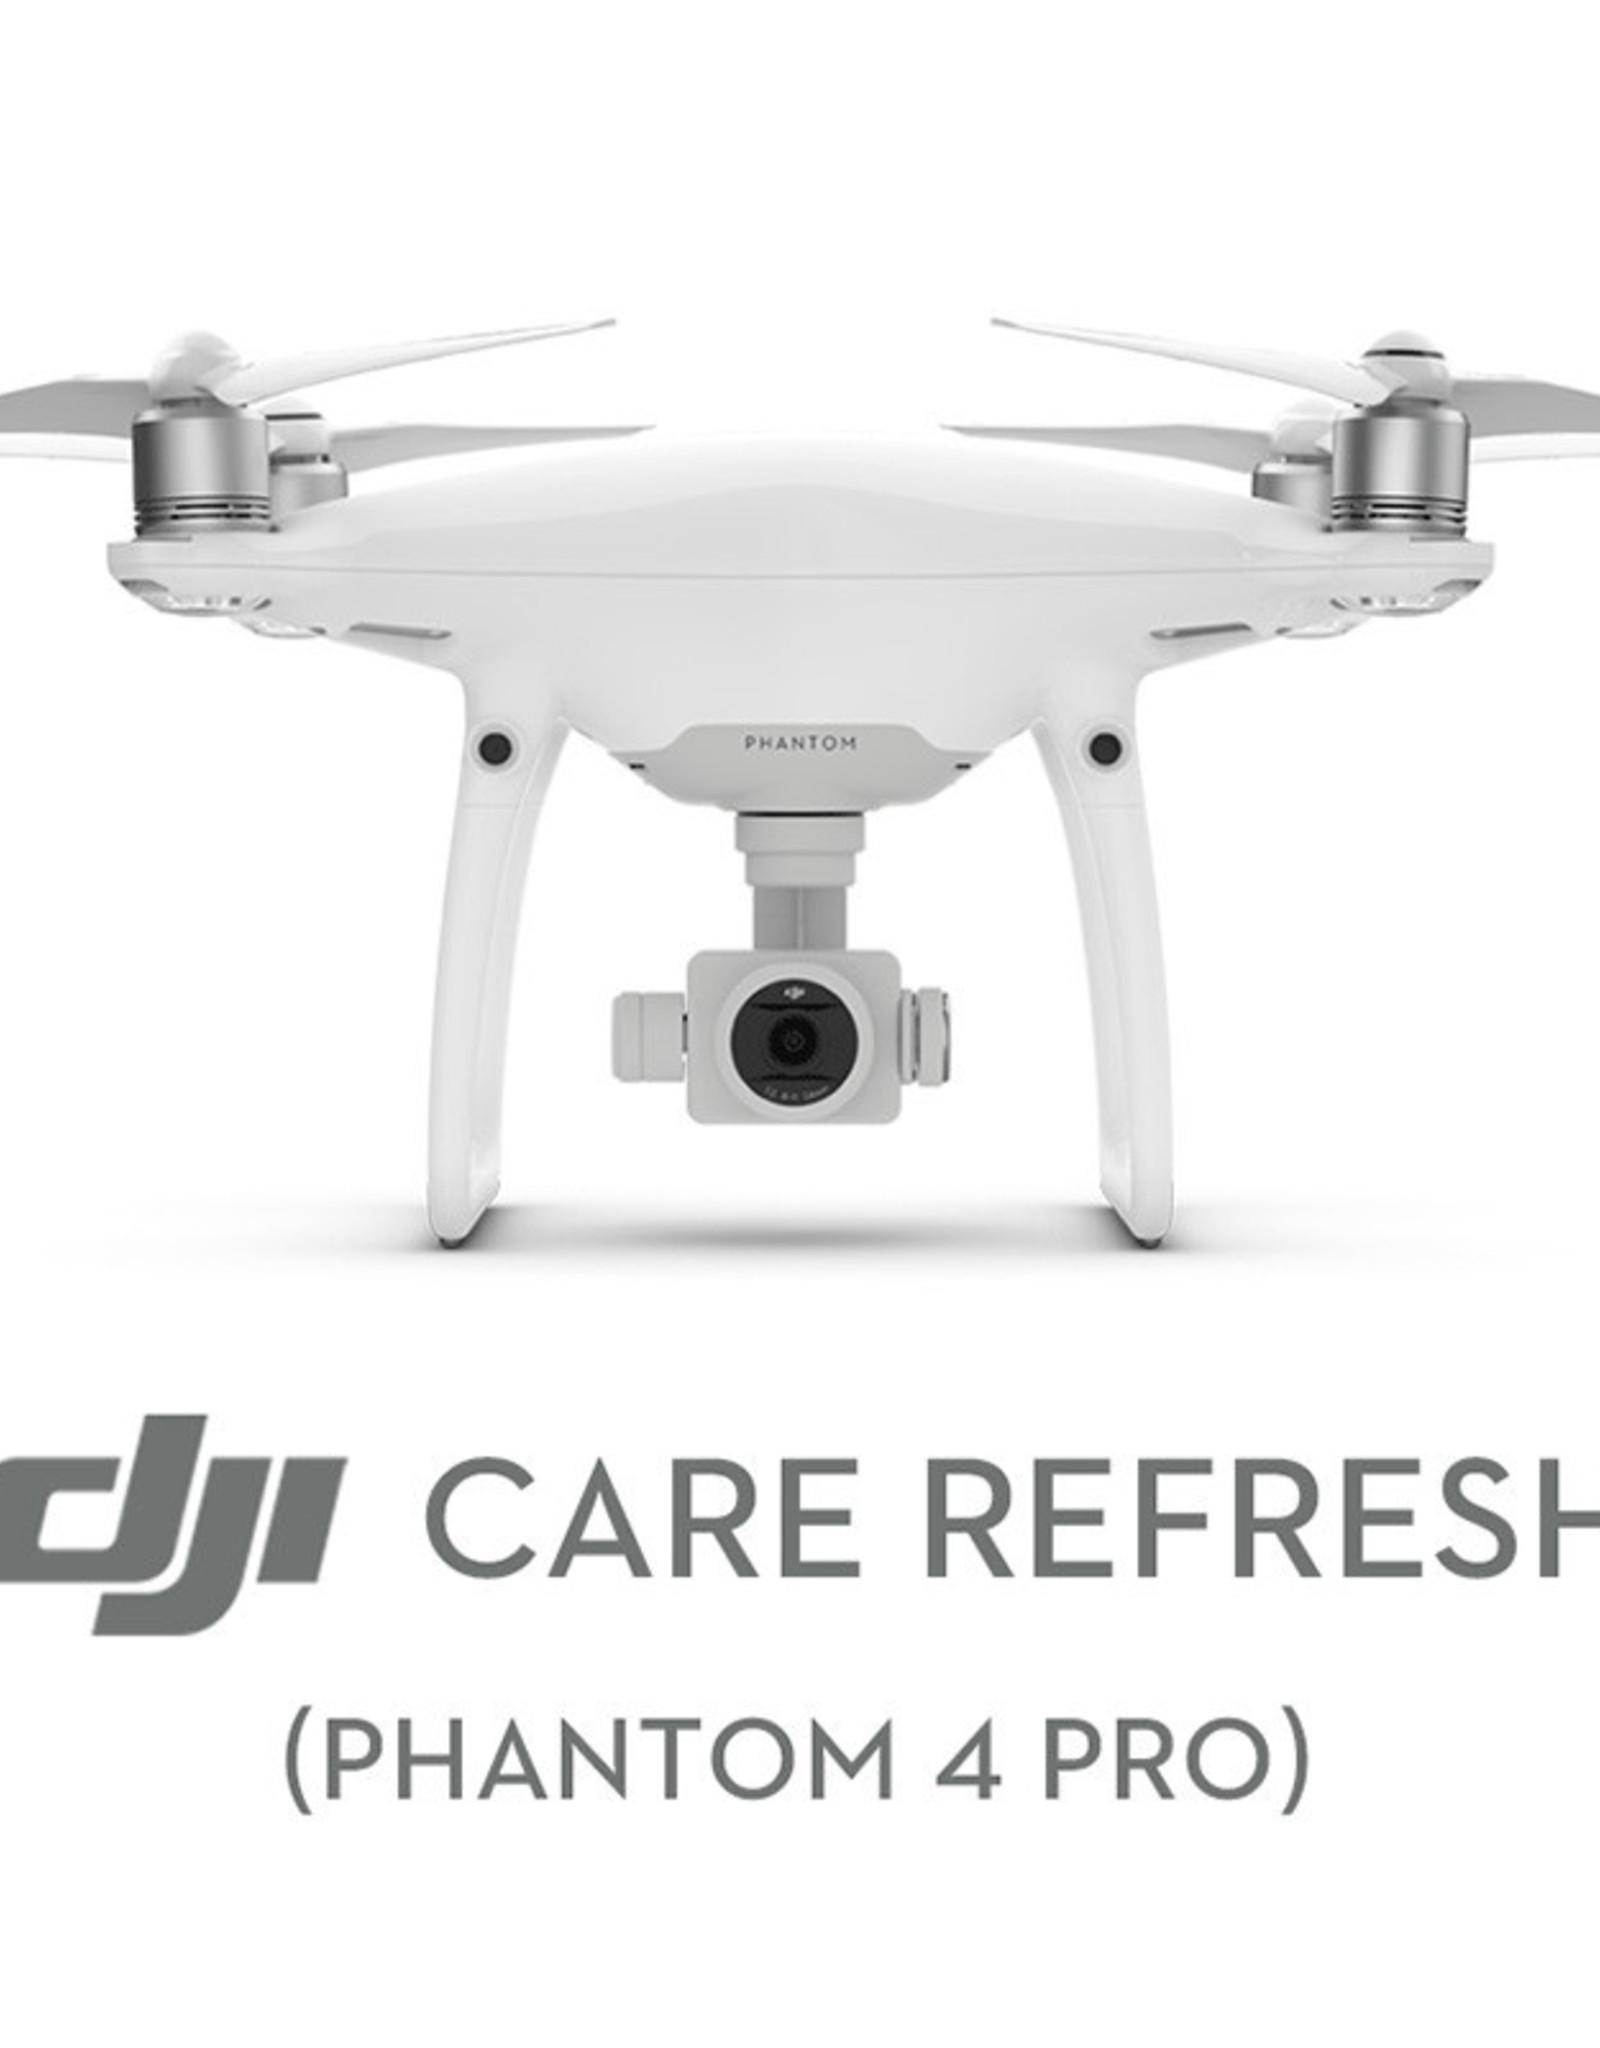 DJI DJI Care Refresh - Phantom 4 Pro/V.2